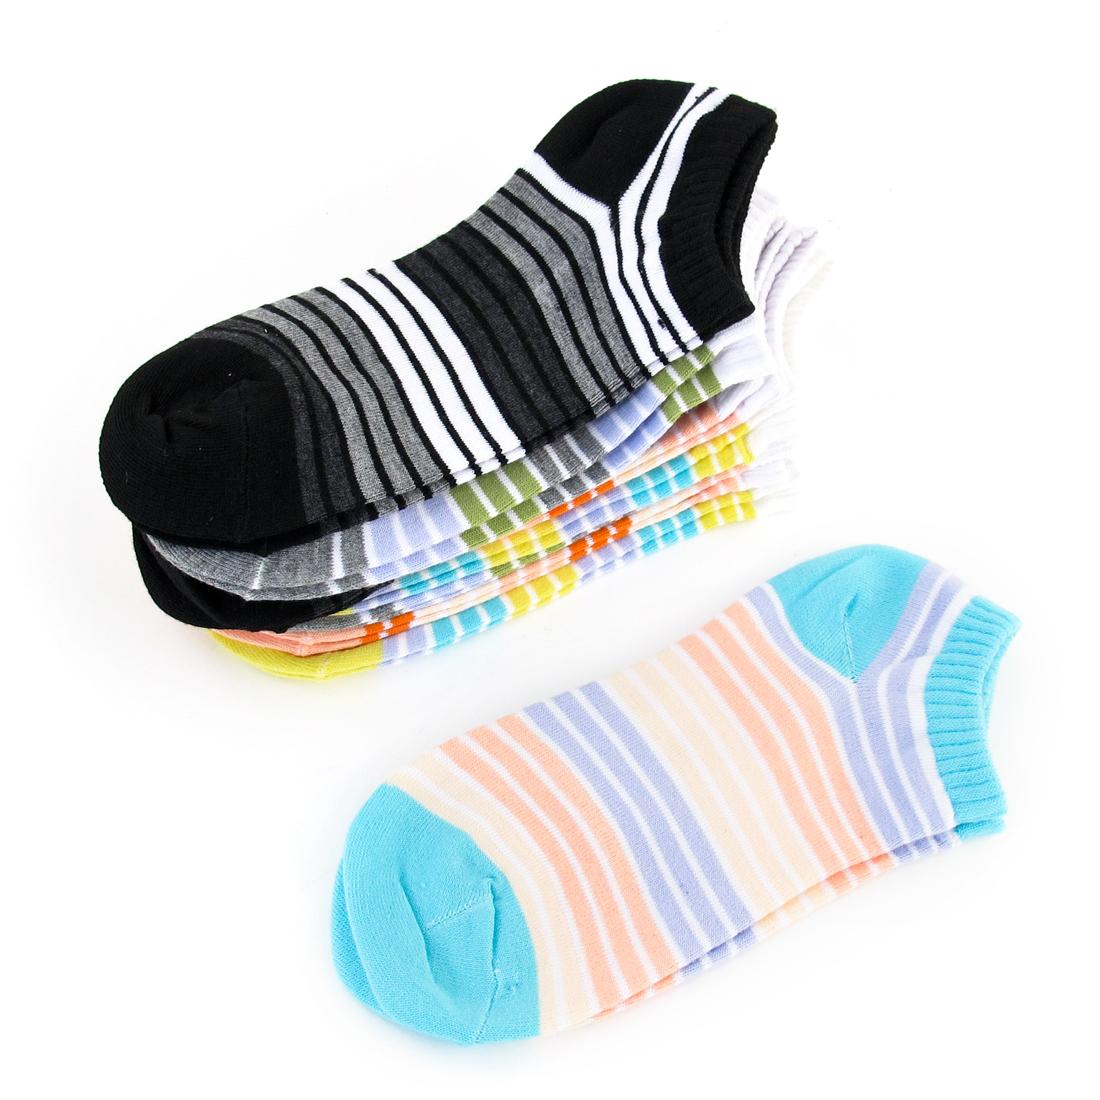 10 Pairs Ladies Stripes Print Black Orange Yellow Knitted Elastic Ankle Socks